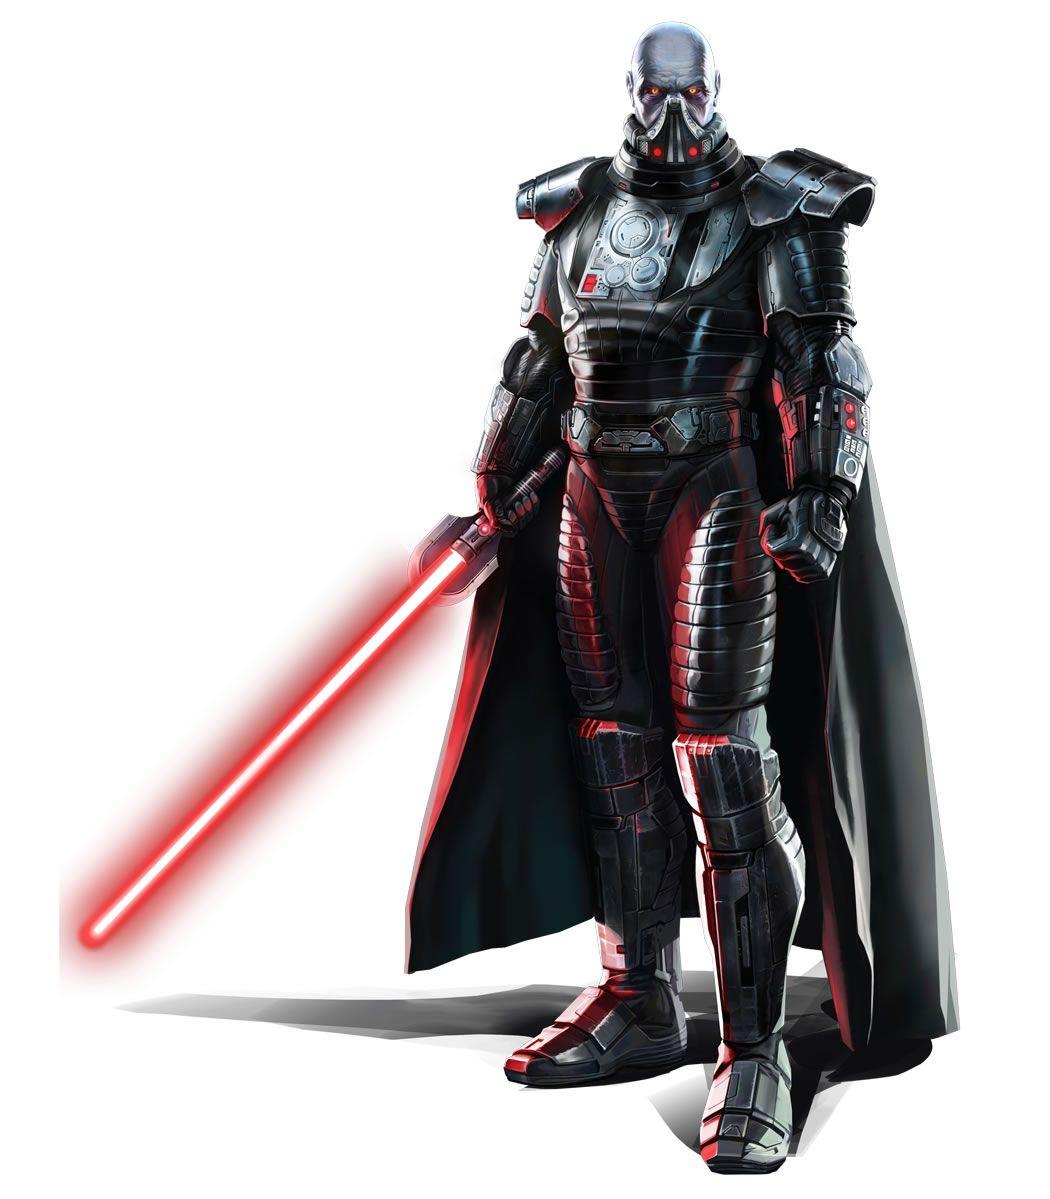 Sith Armor Google Search Star Wars Villains Star Wars Sith Sith Warrior